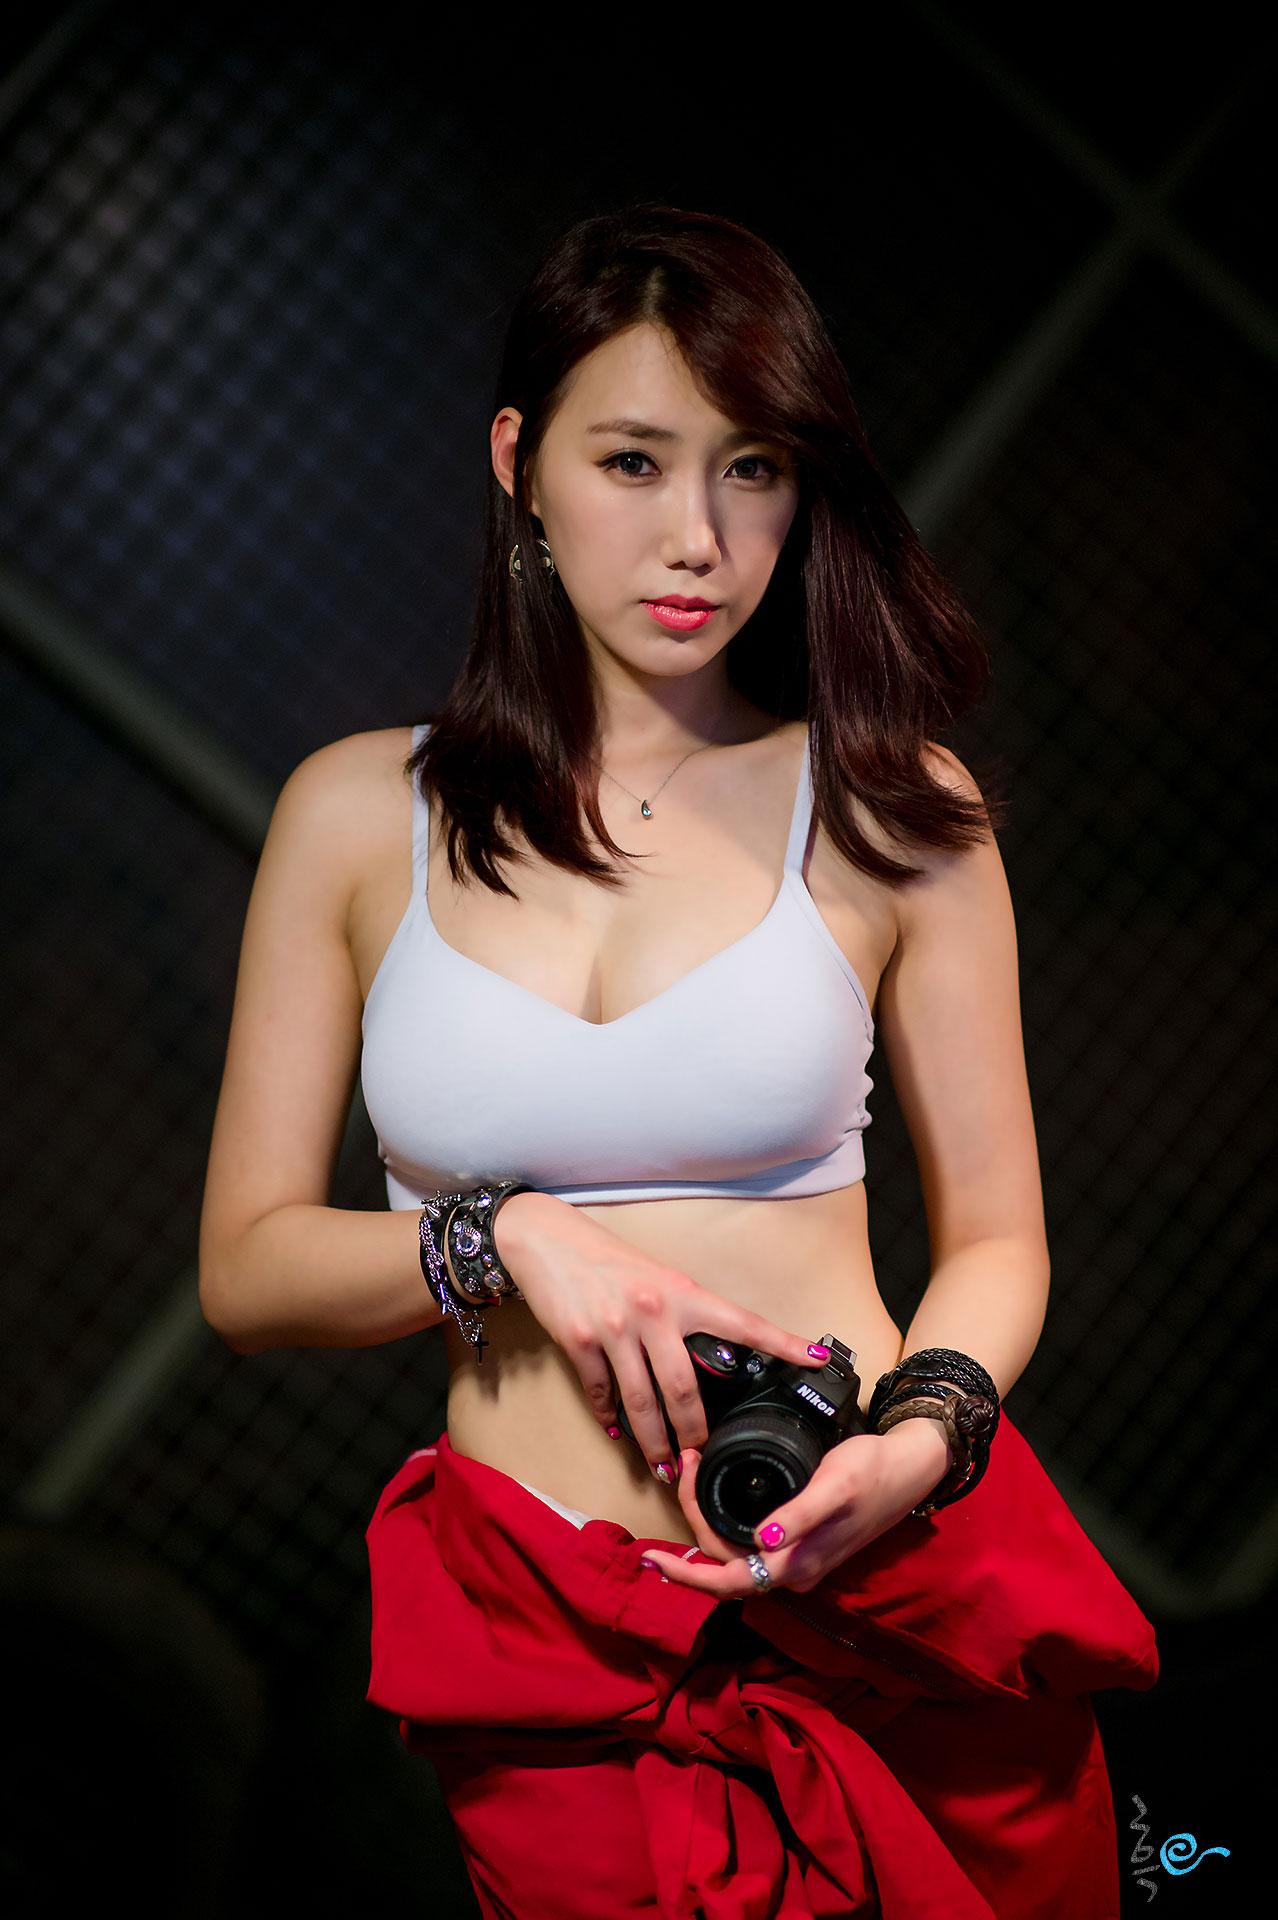 Lee Sung Hwa Photo Imaging 2014 Nikon